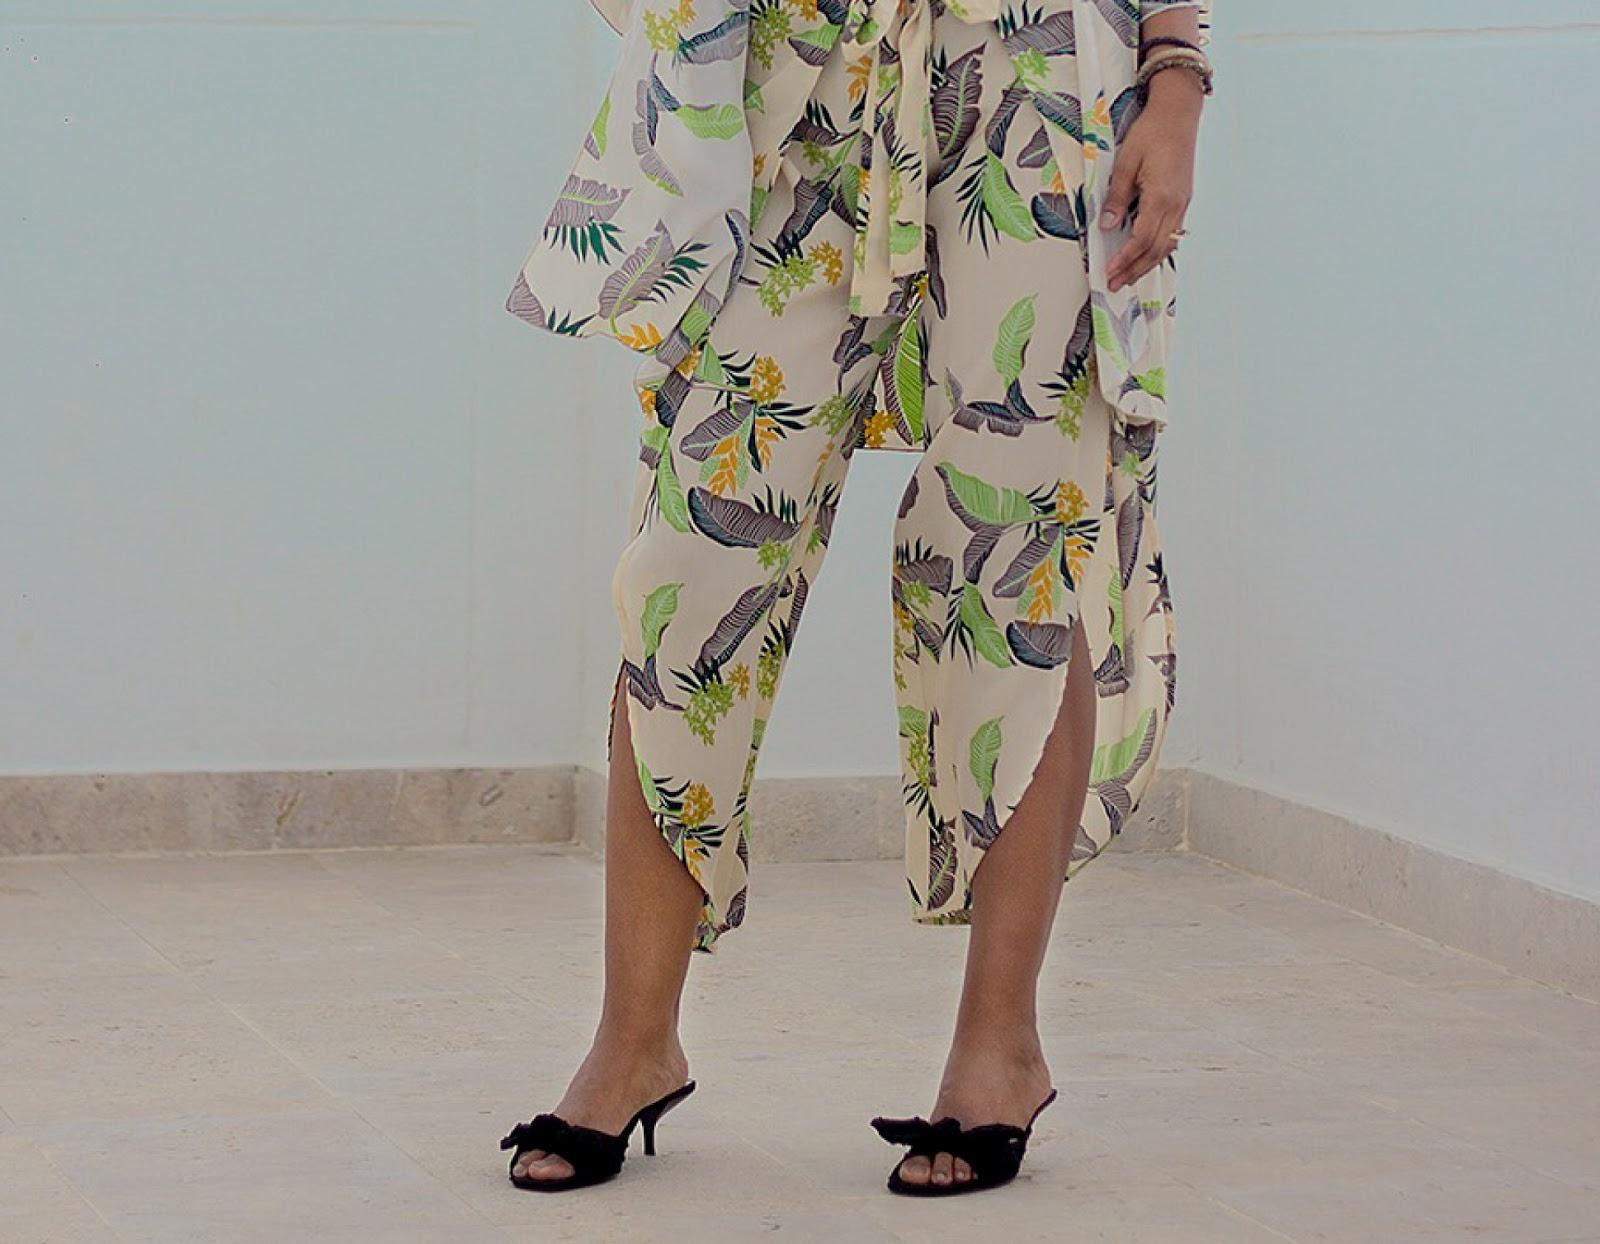 Tropical Yiniva Tendencia Fashion Moda Blogger Elegancia Soto Look zVpUqSM